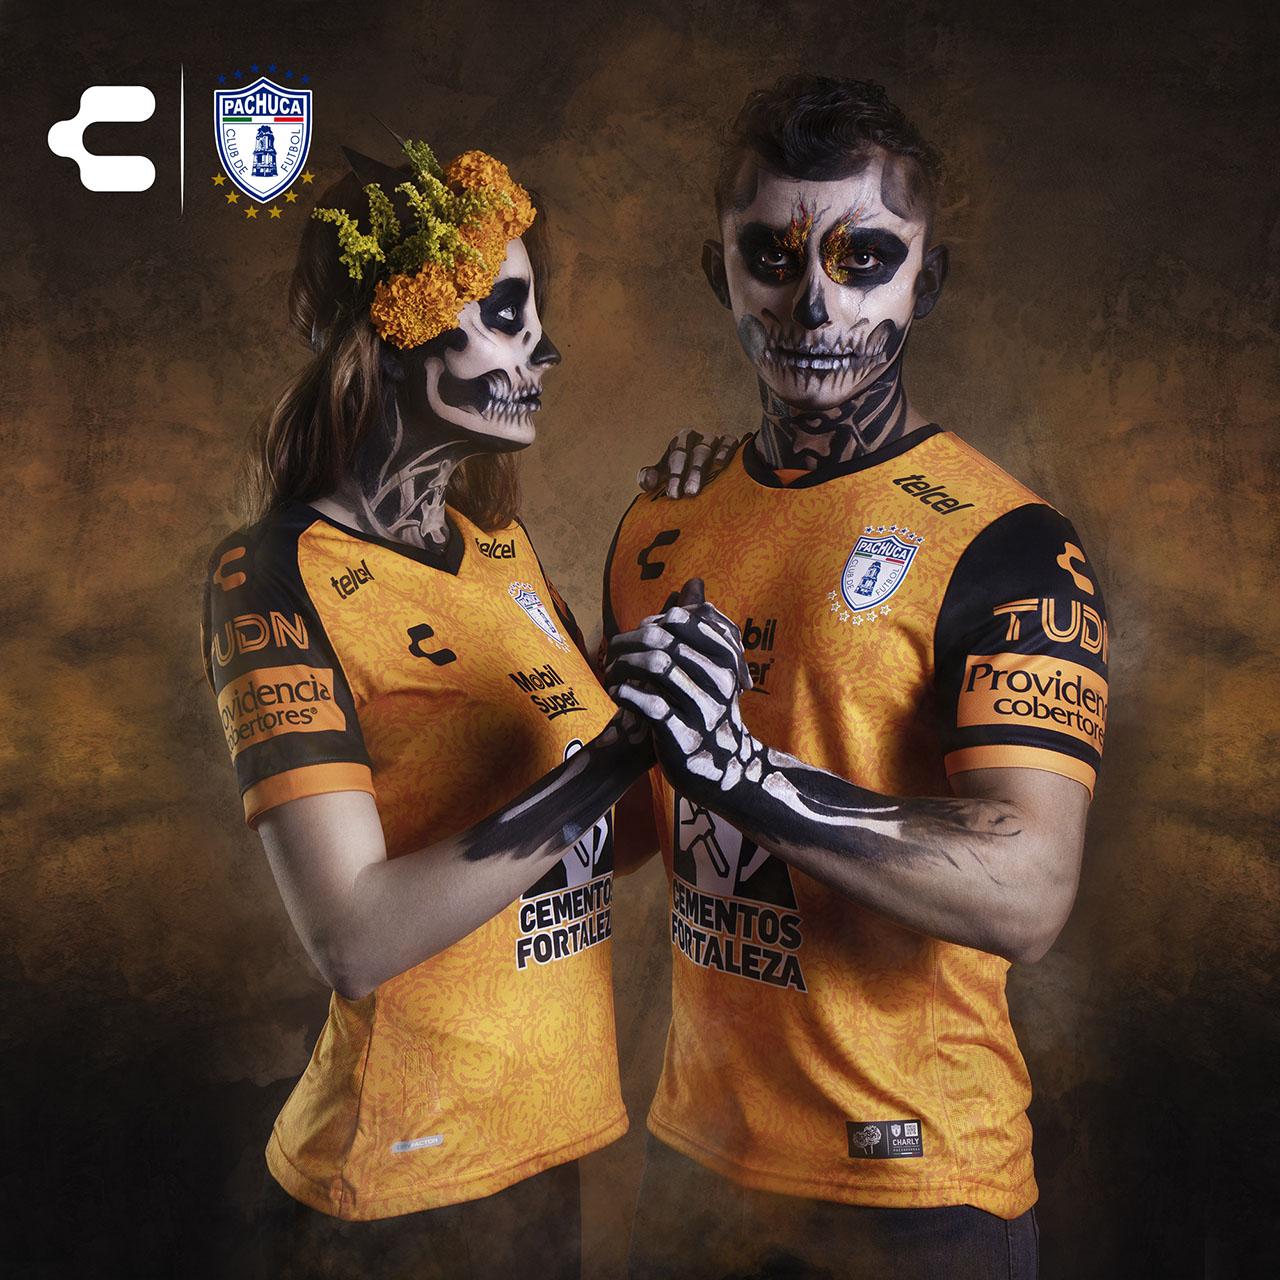 Camisa Dia de Los Muertos do Pachuca 2020 Charly